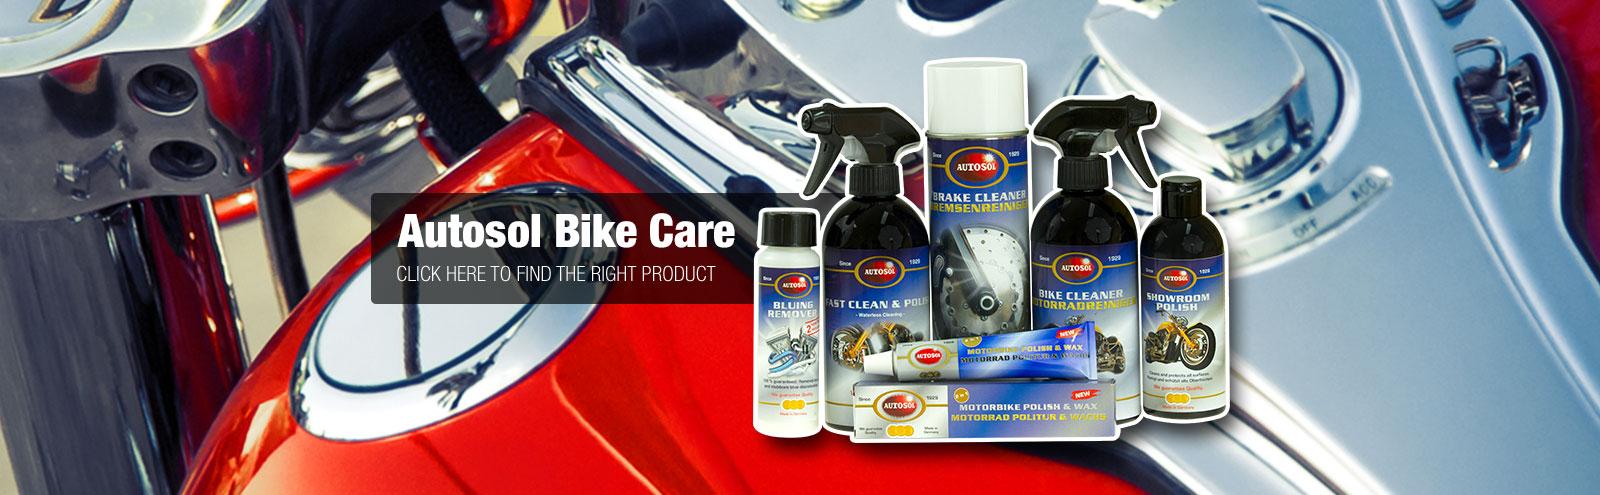 autosol-bike